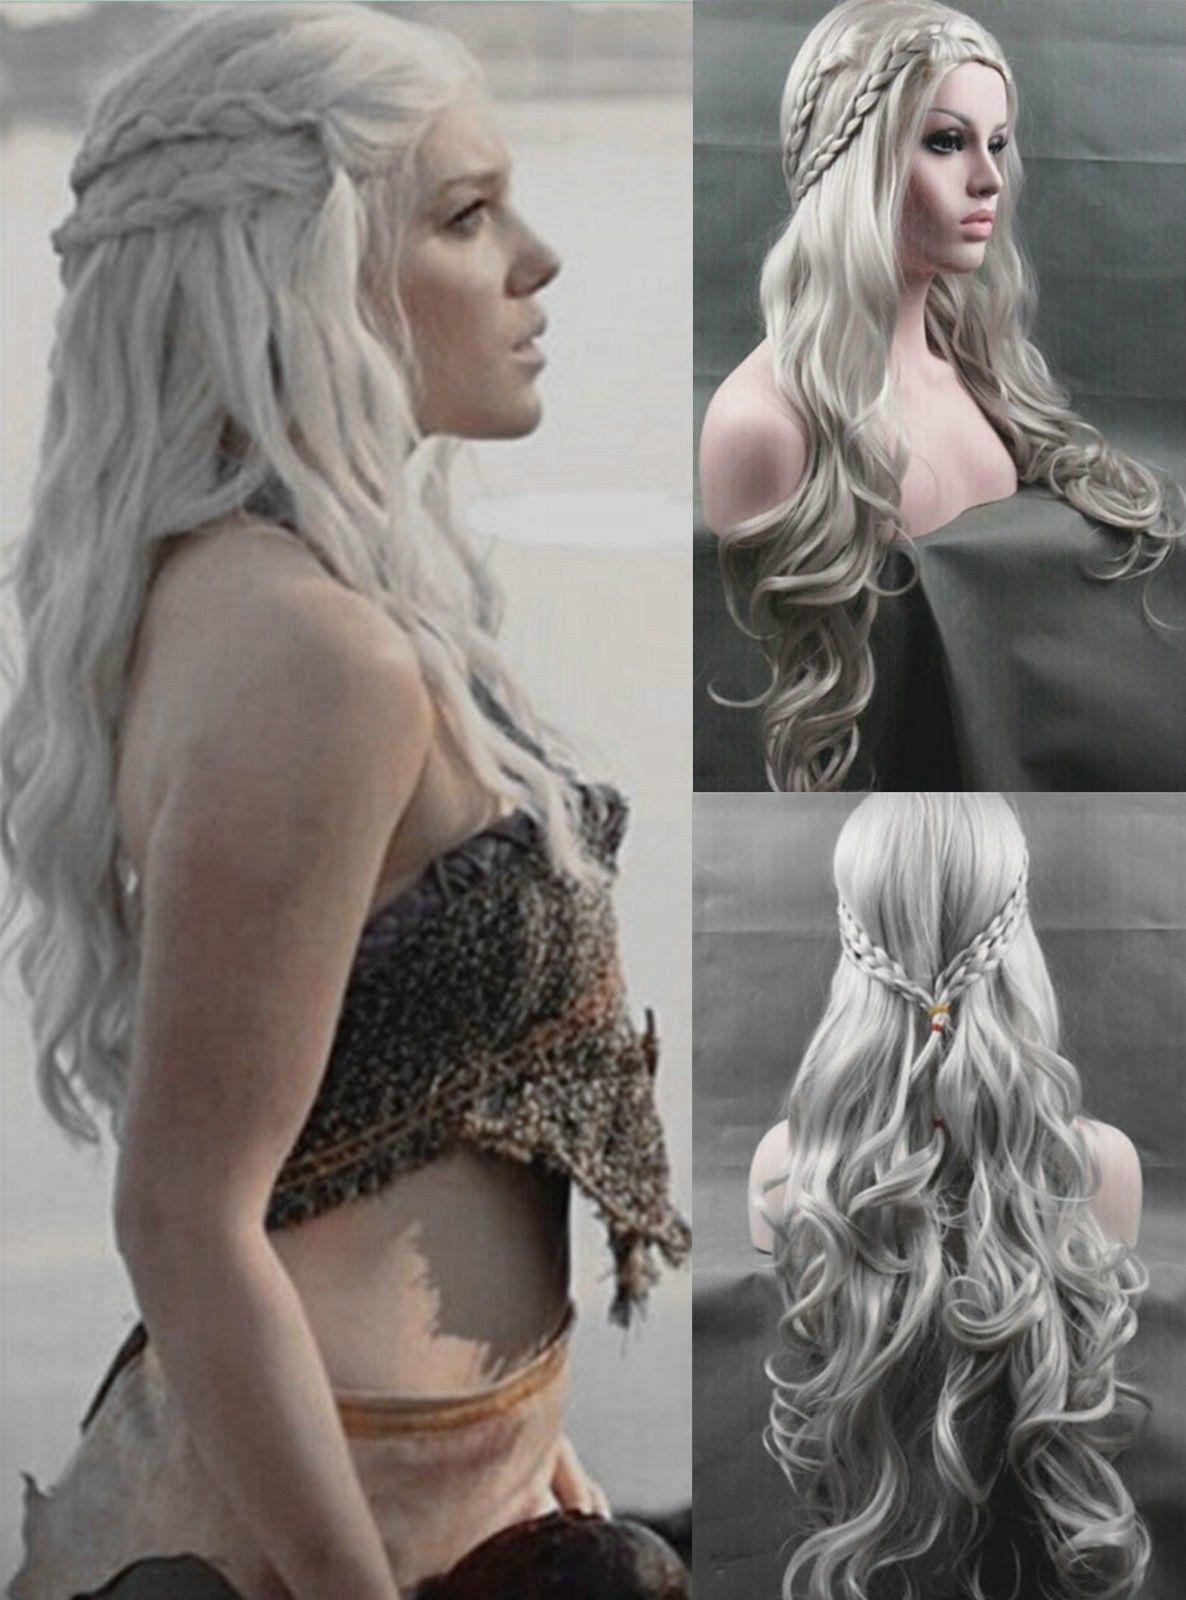 Daenerys Targaryen Silver Wavy Wig Dragon Princess Game Of Thrones Braids Cosplay Wigs Costumes